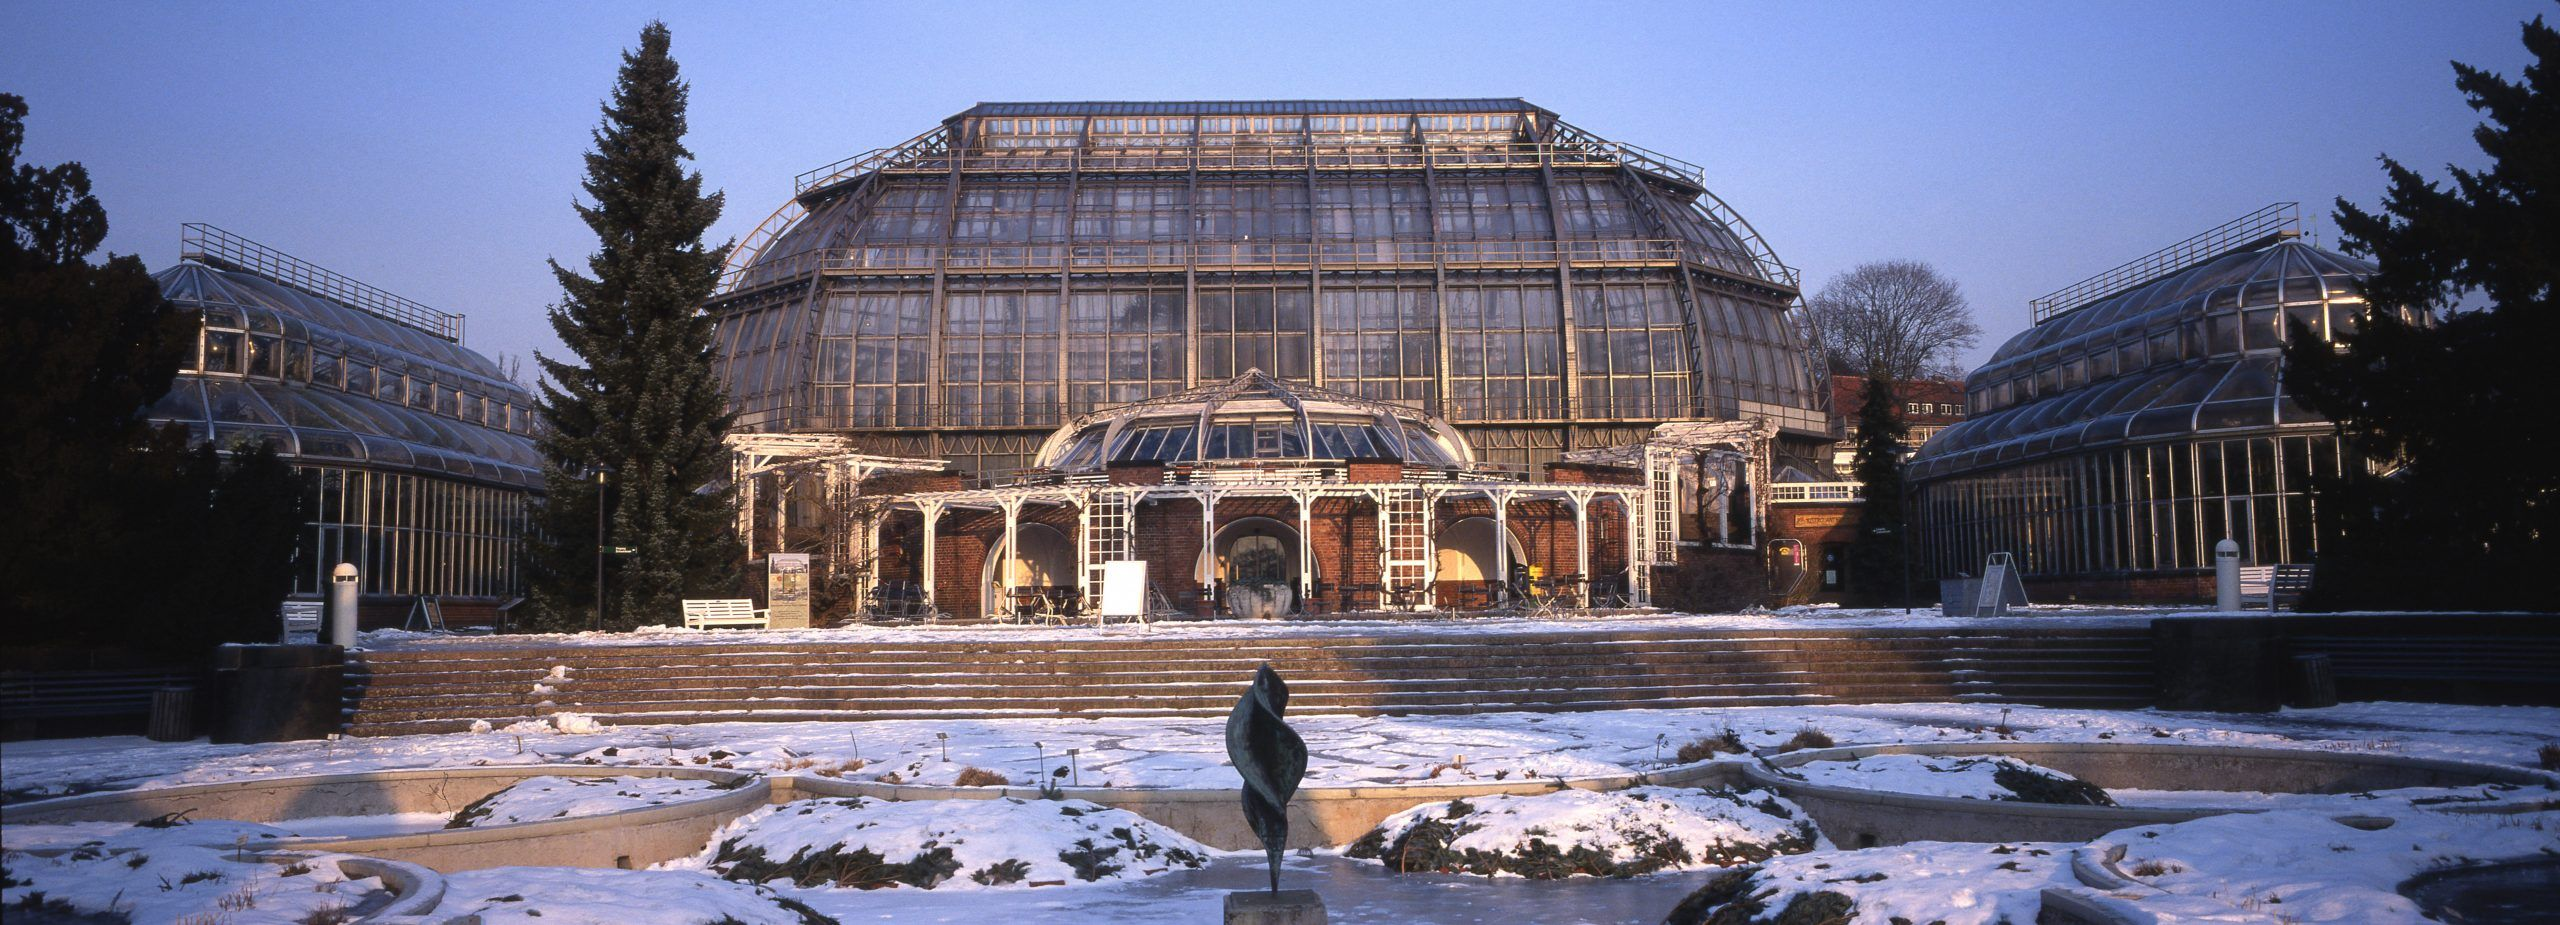 Botanischer Garten Berlin Winter Botanischer Garten Berlin Botanischer Garten Garten